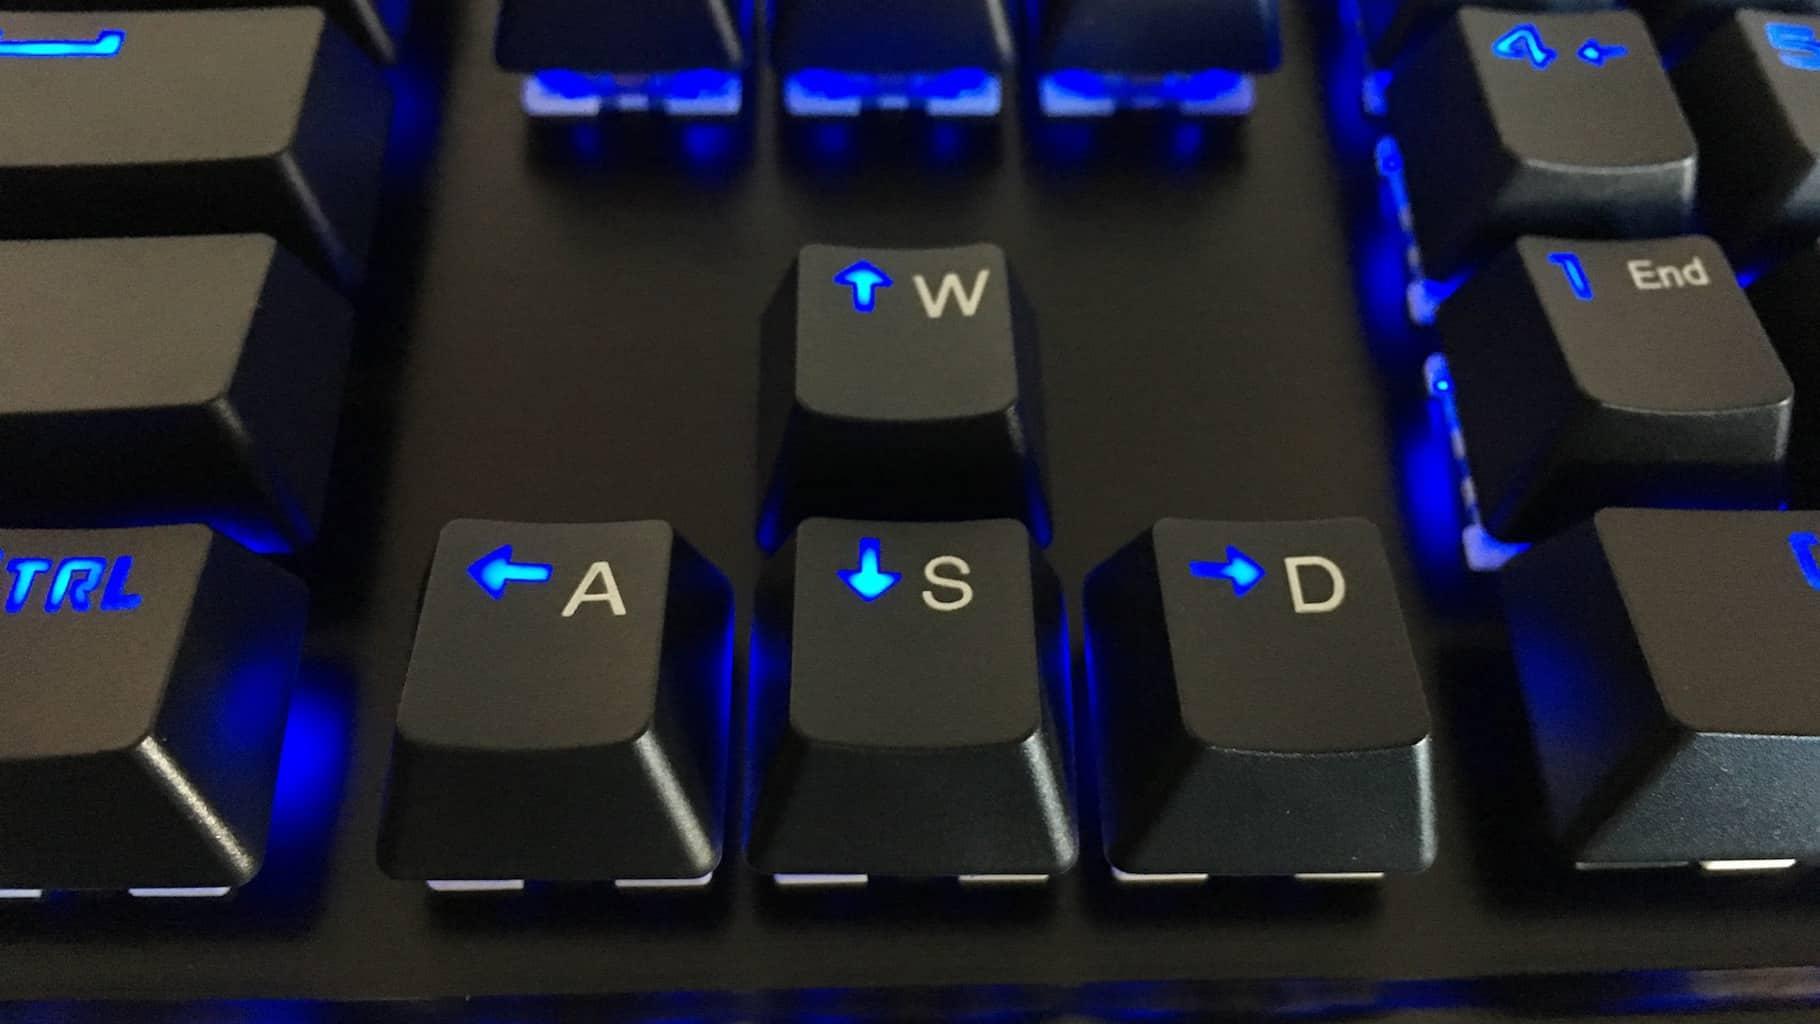 Eagletec Kg010 Mechanical Keyboard Review Win10 Faq